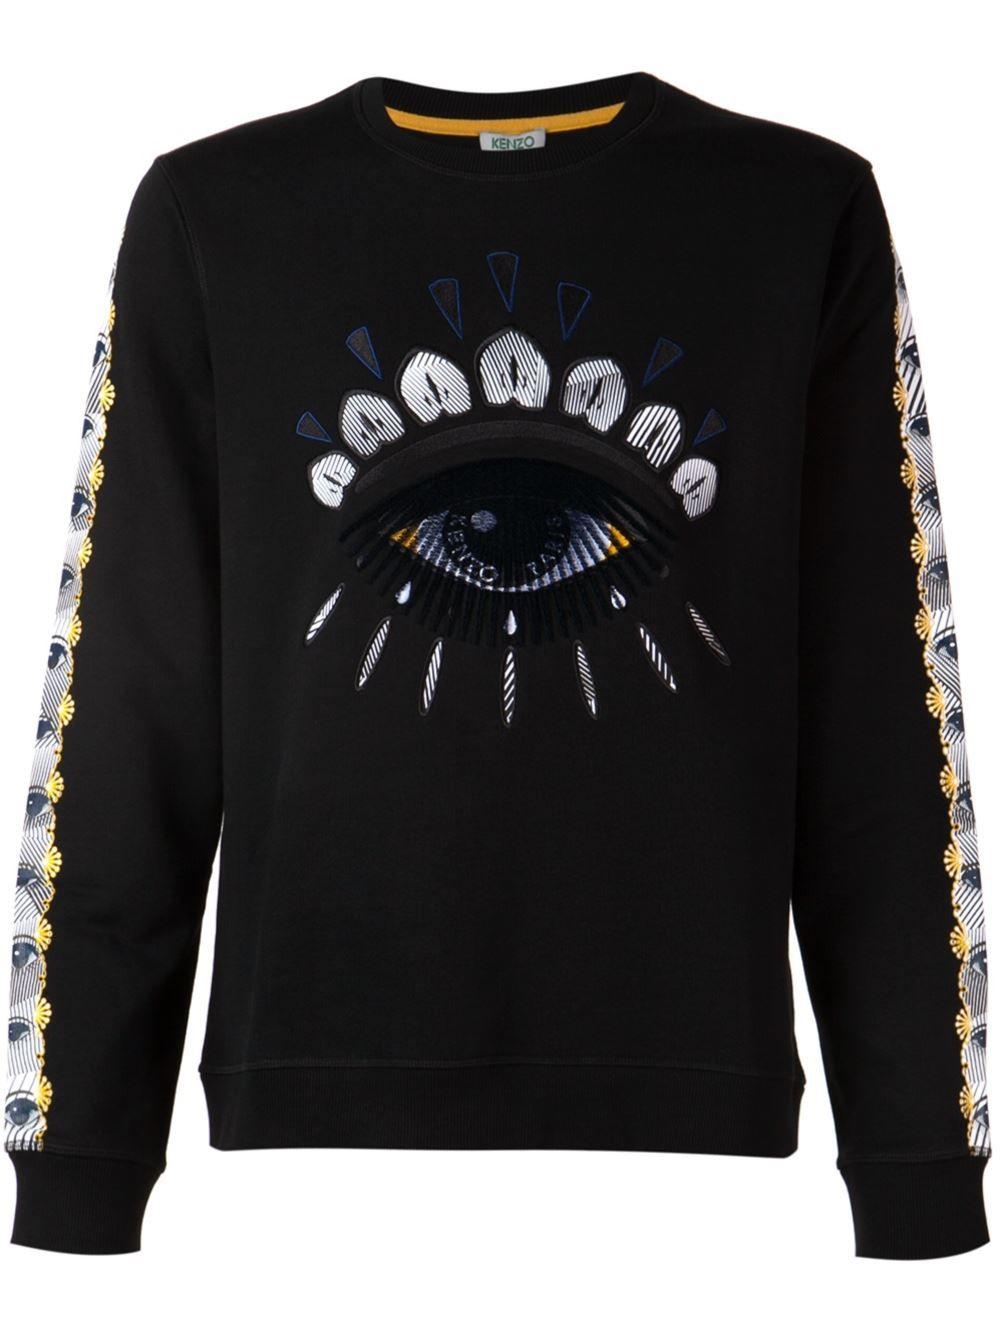 Cheap Kenzo Eye Sweatshirt